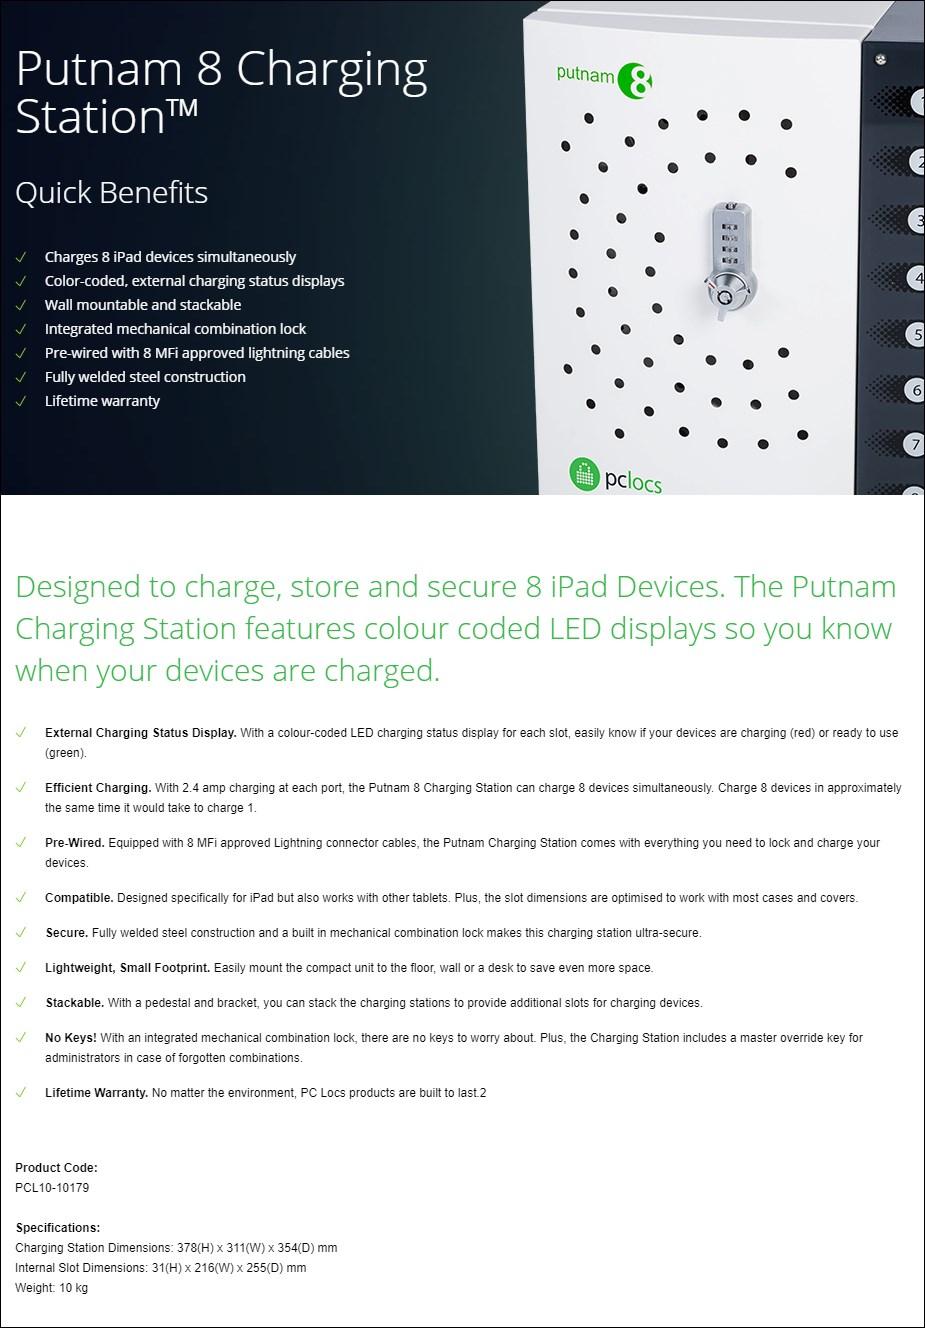 PC Locs Putnam 8 Charging Station - Overview 1